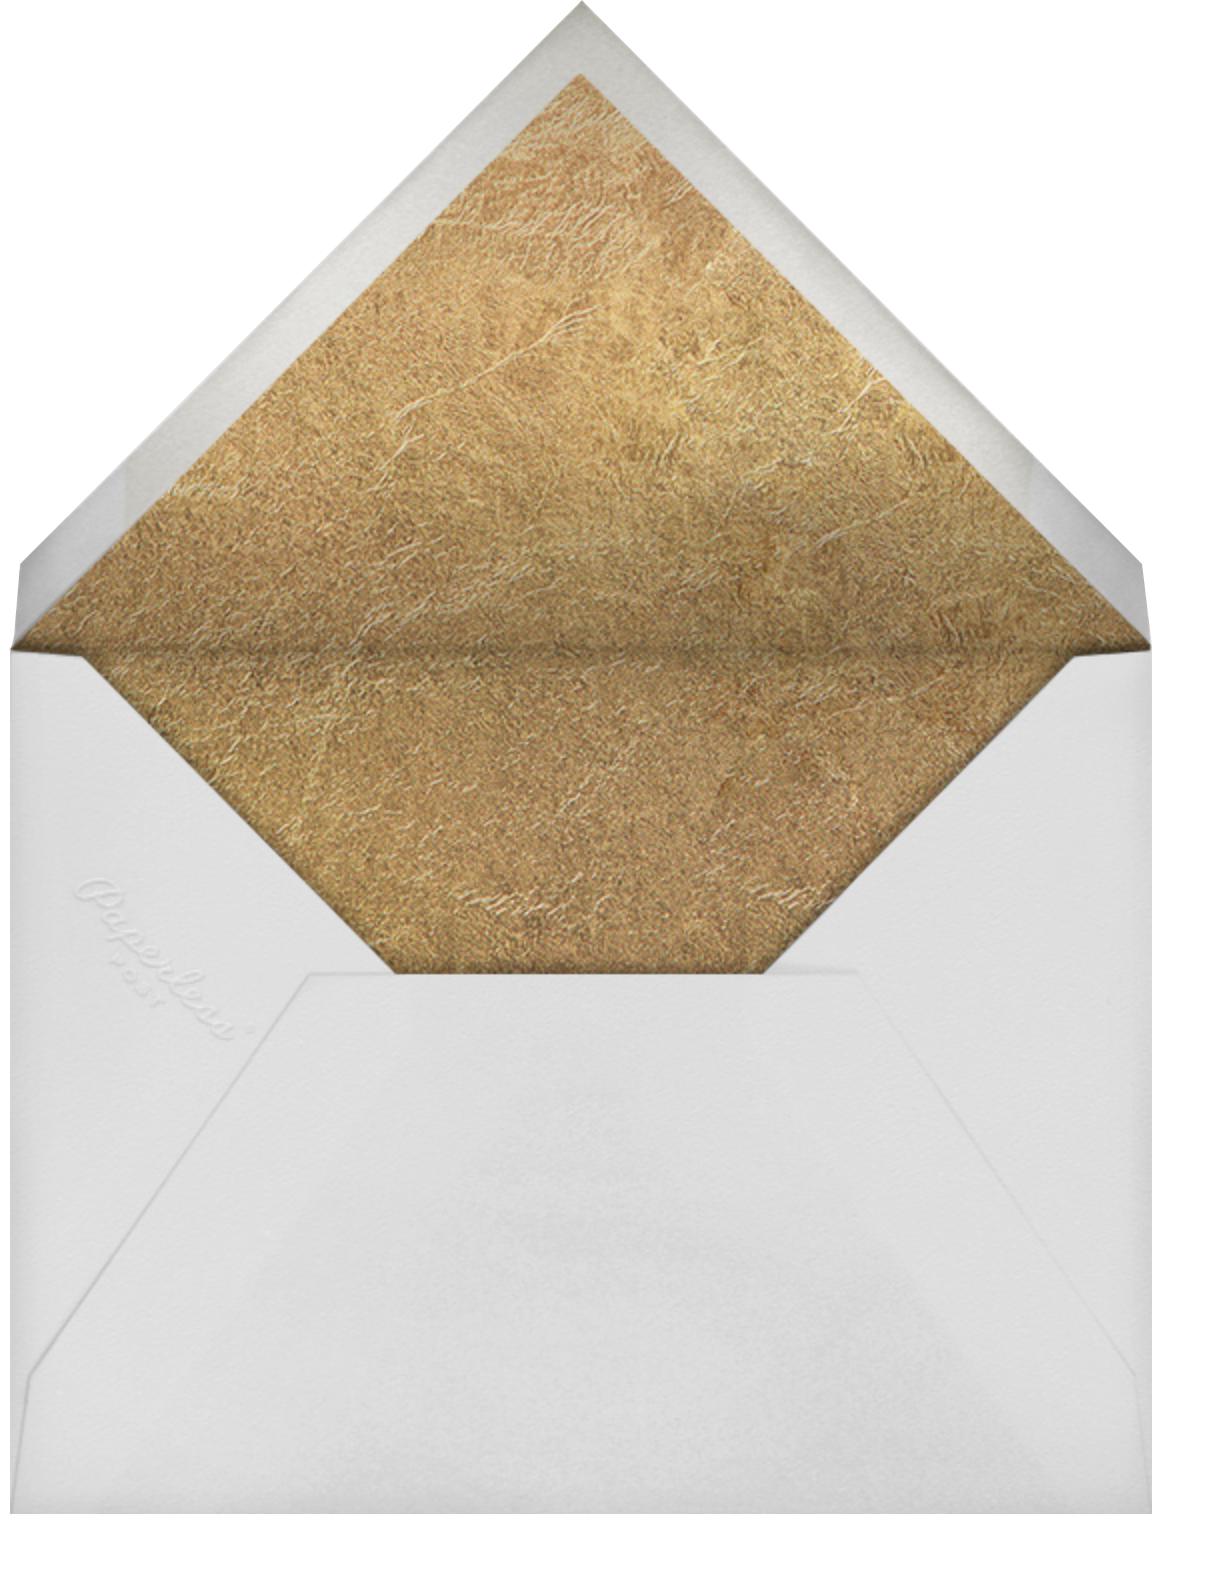 Garde (Square) - Kelly Wearstler - Save the date - envelope back